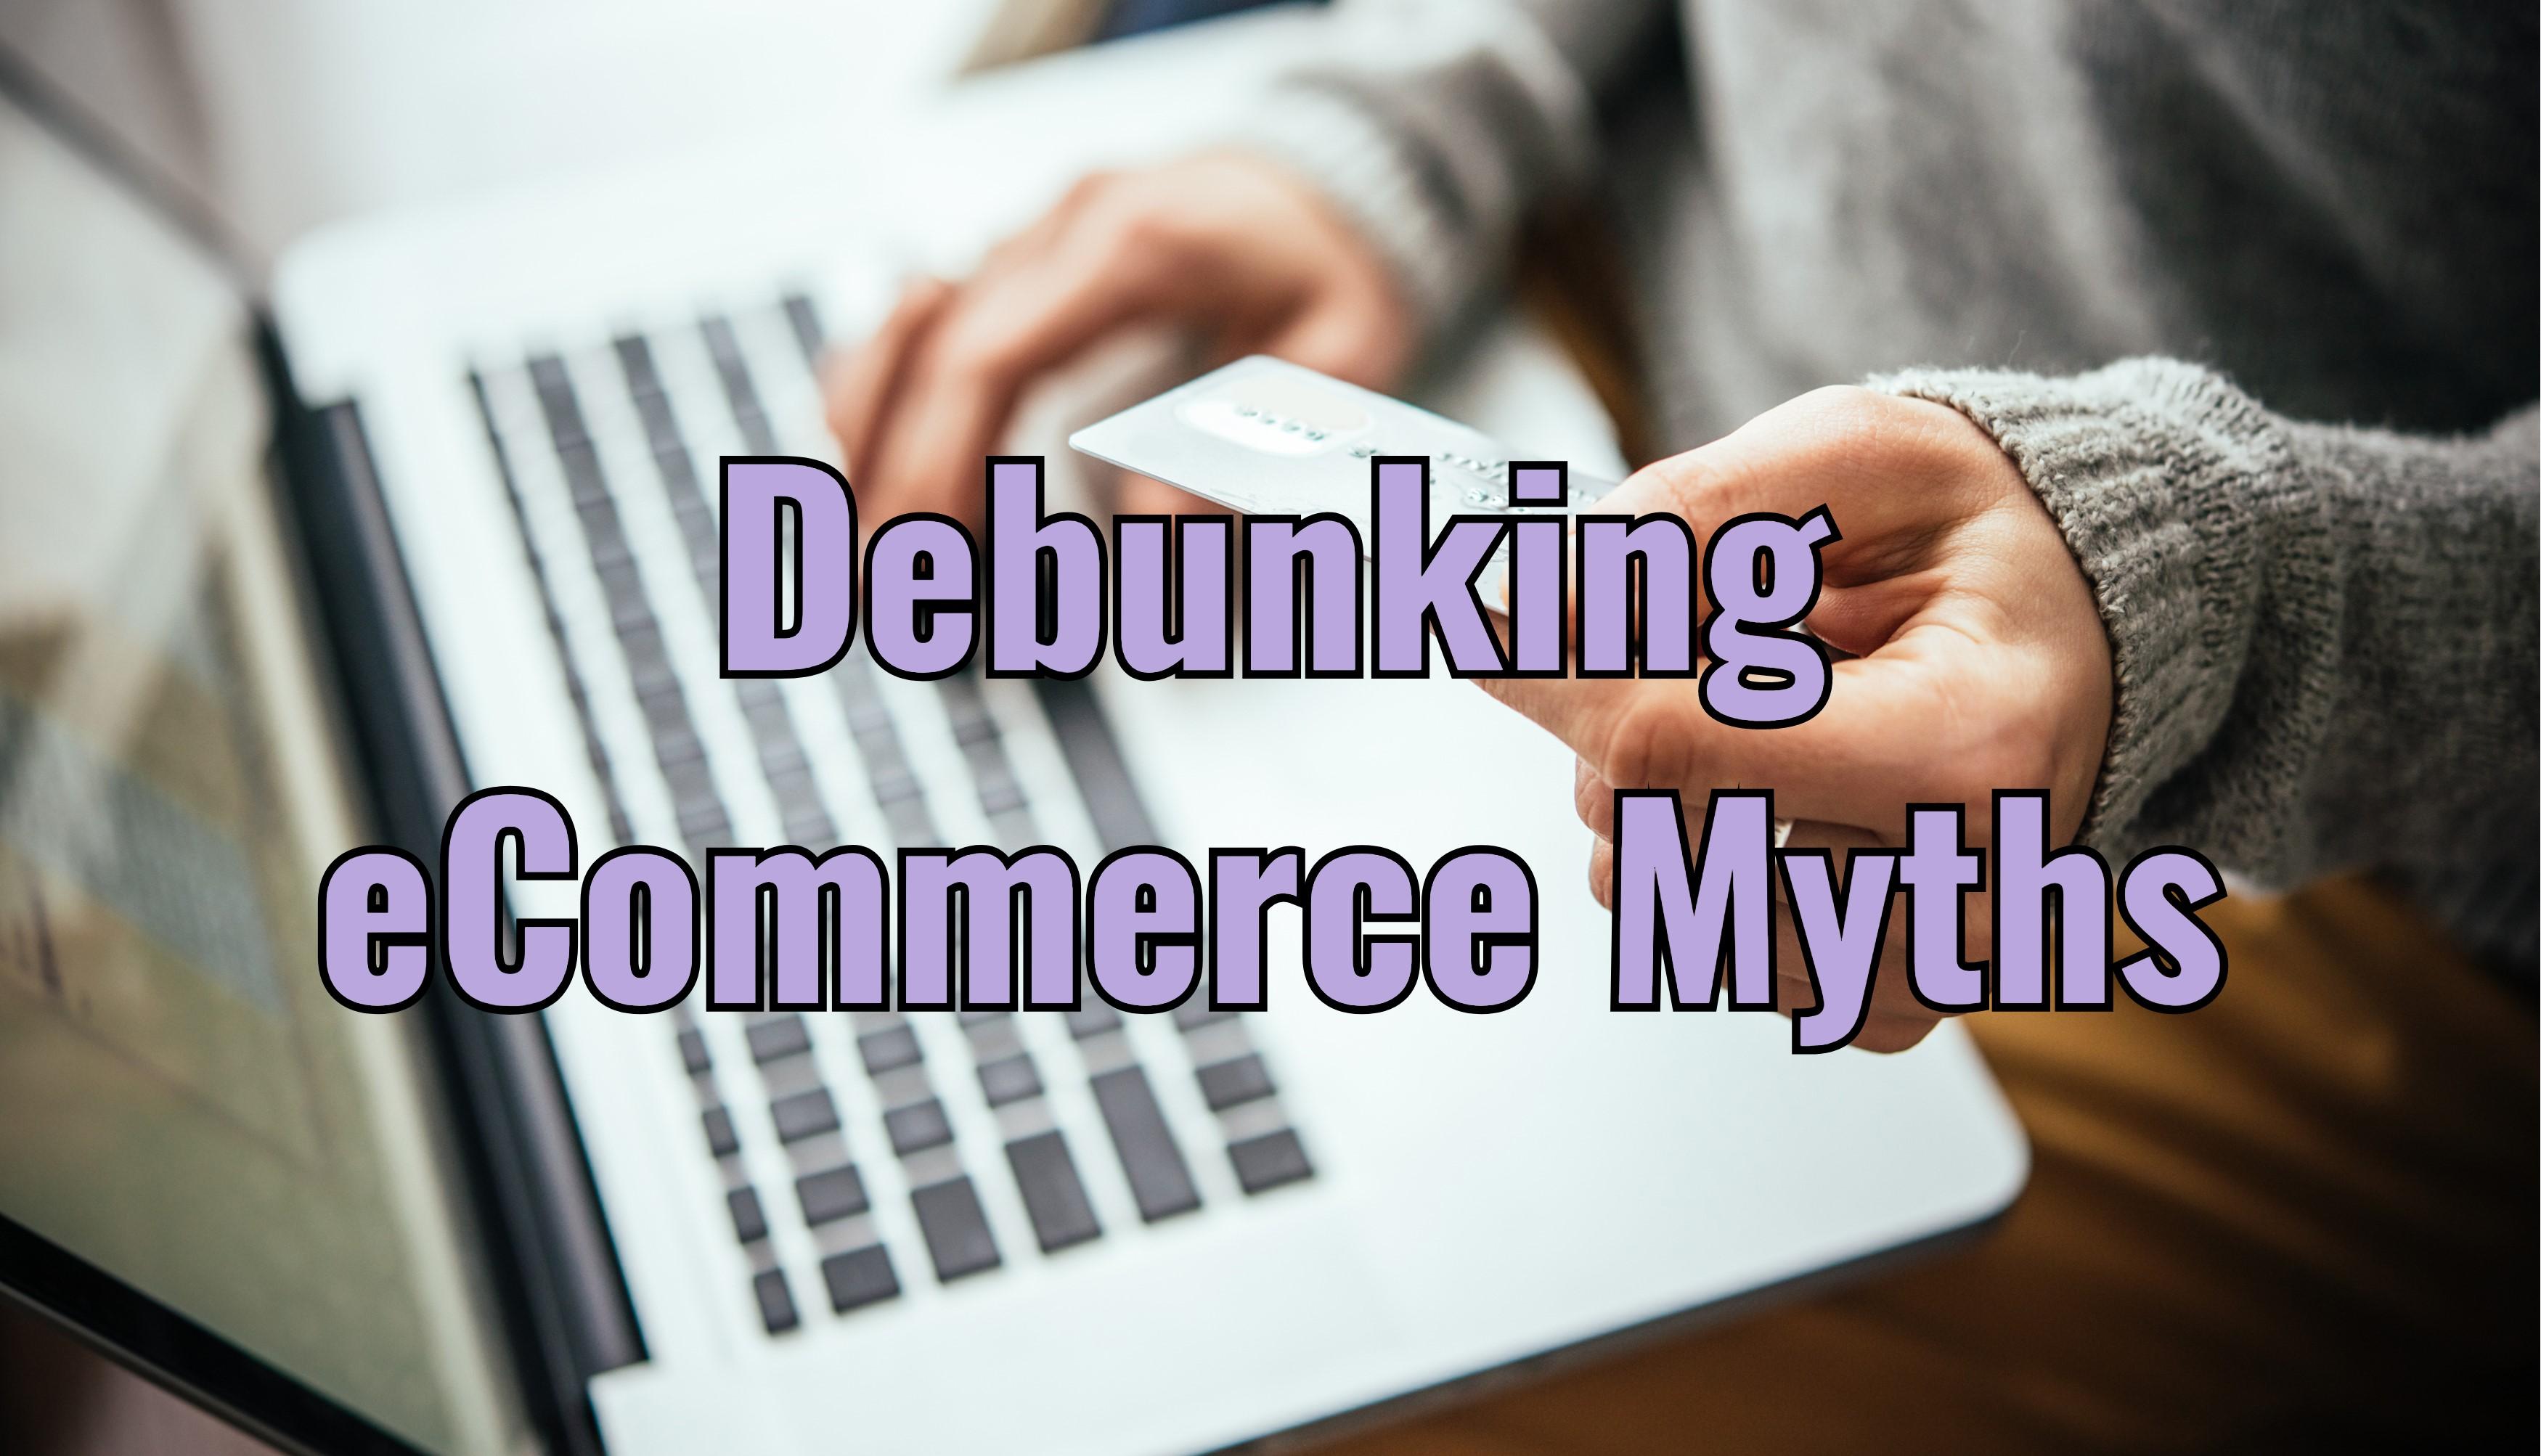 Debunking eCommerce Myths